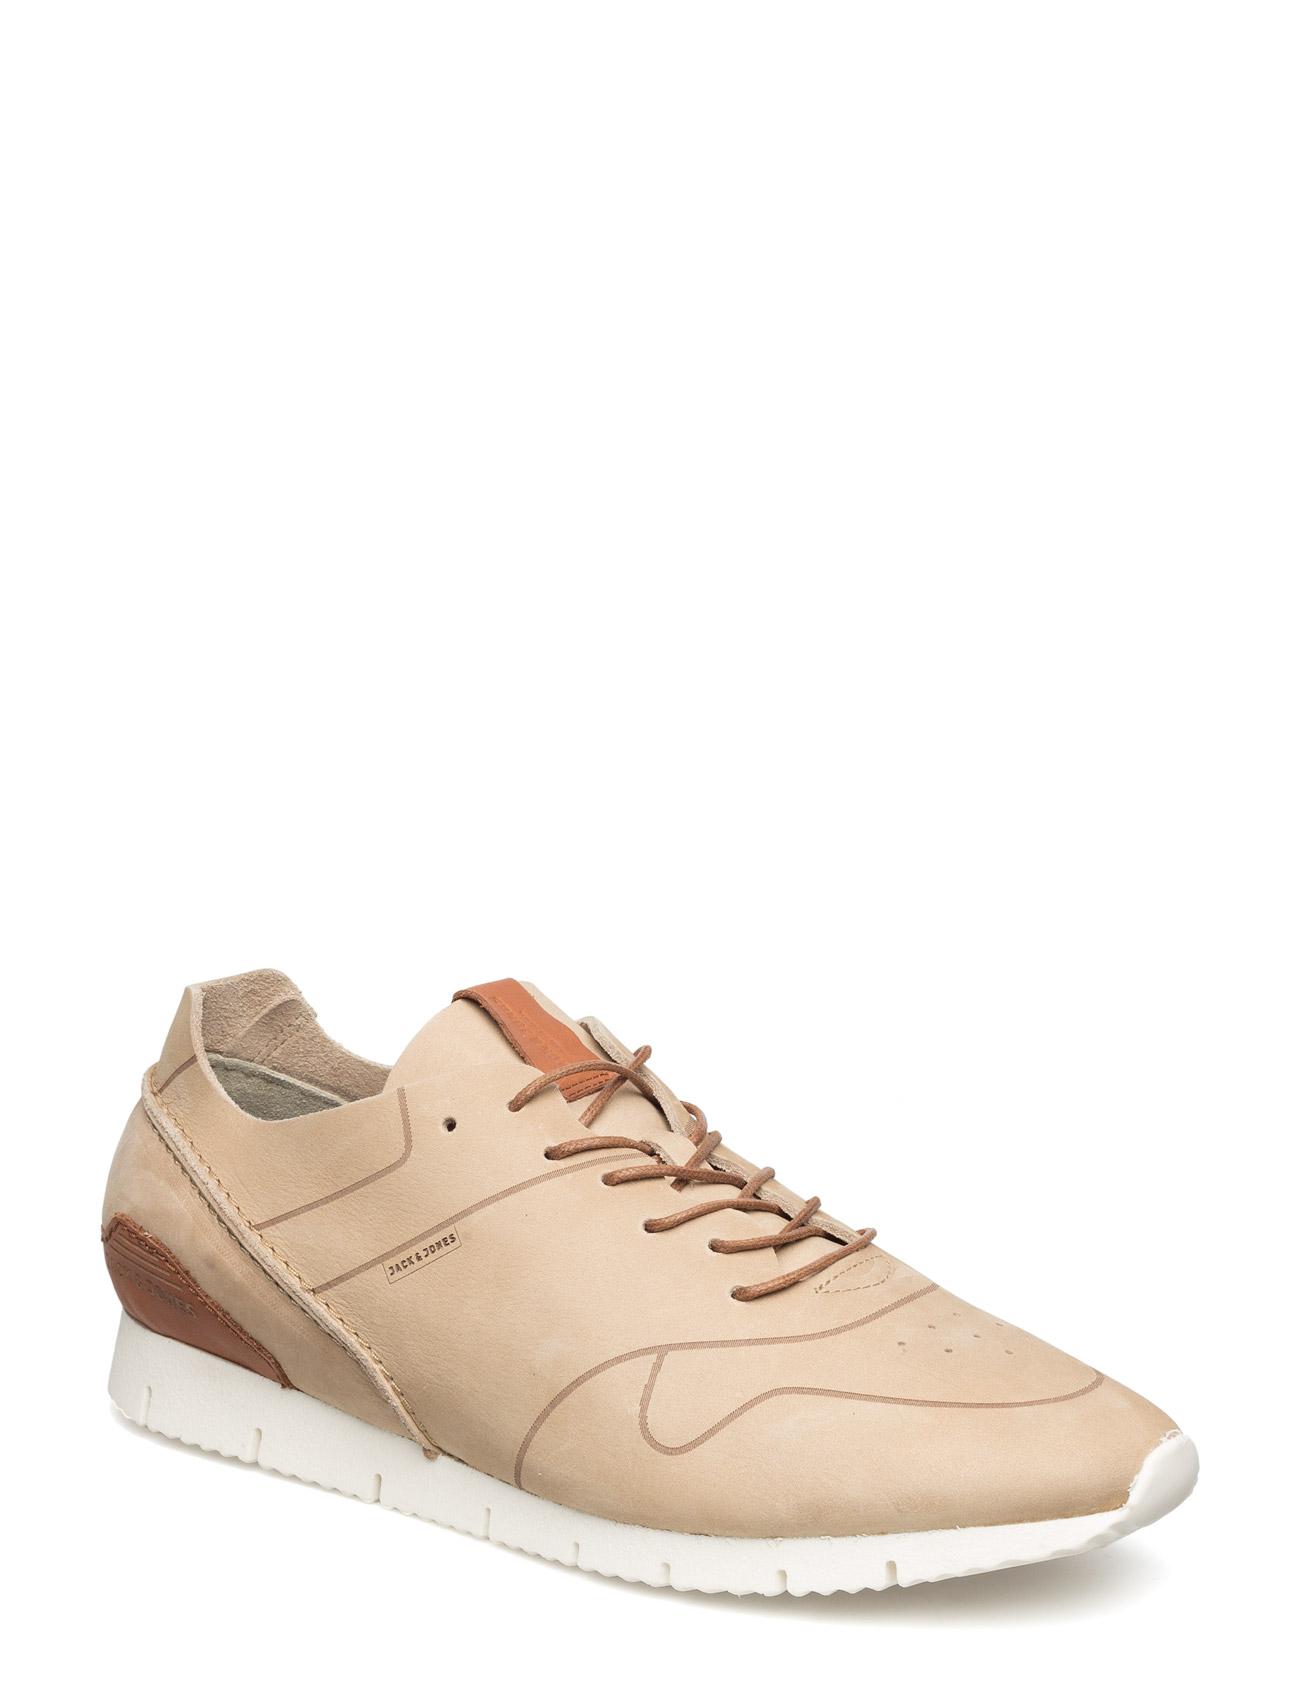 Jjrobson Leather Sneaker Plaza Taupe Jack & Jones Sneakers til Herrer i